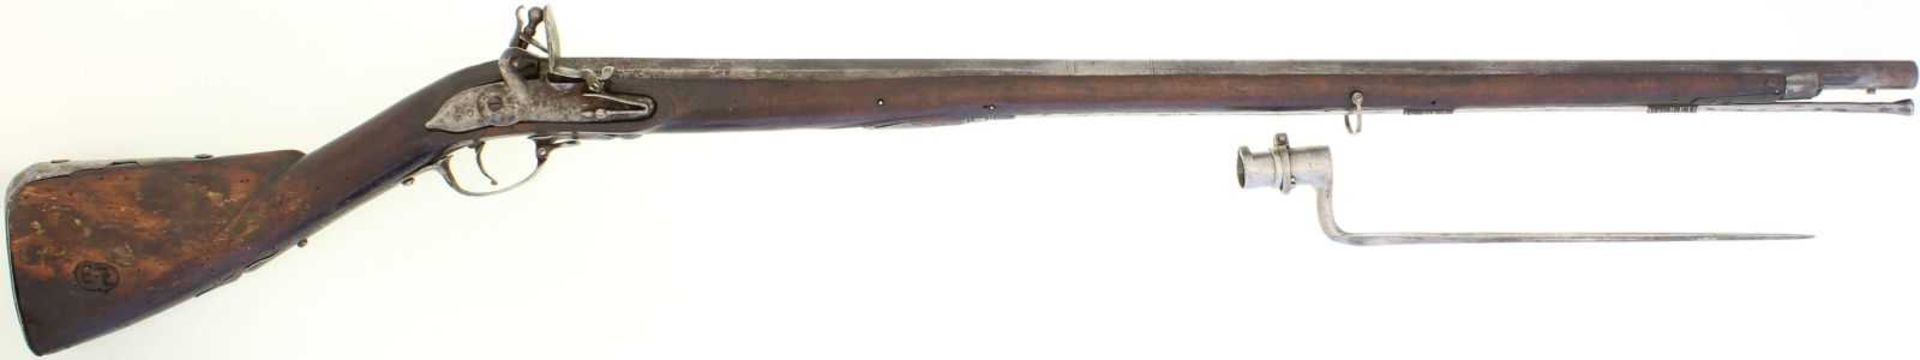 Steinschlossgewehr, Kanton Bern, um 1750, Kal. 18mm LL 995mm, TL 1365mm, Rundlauf, hinterer